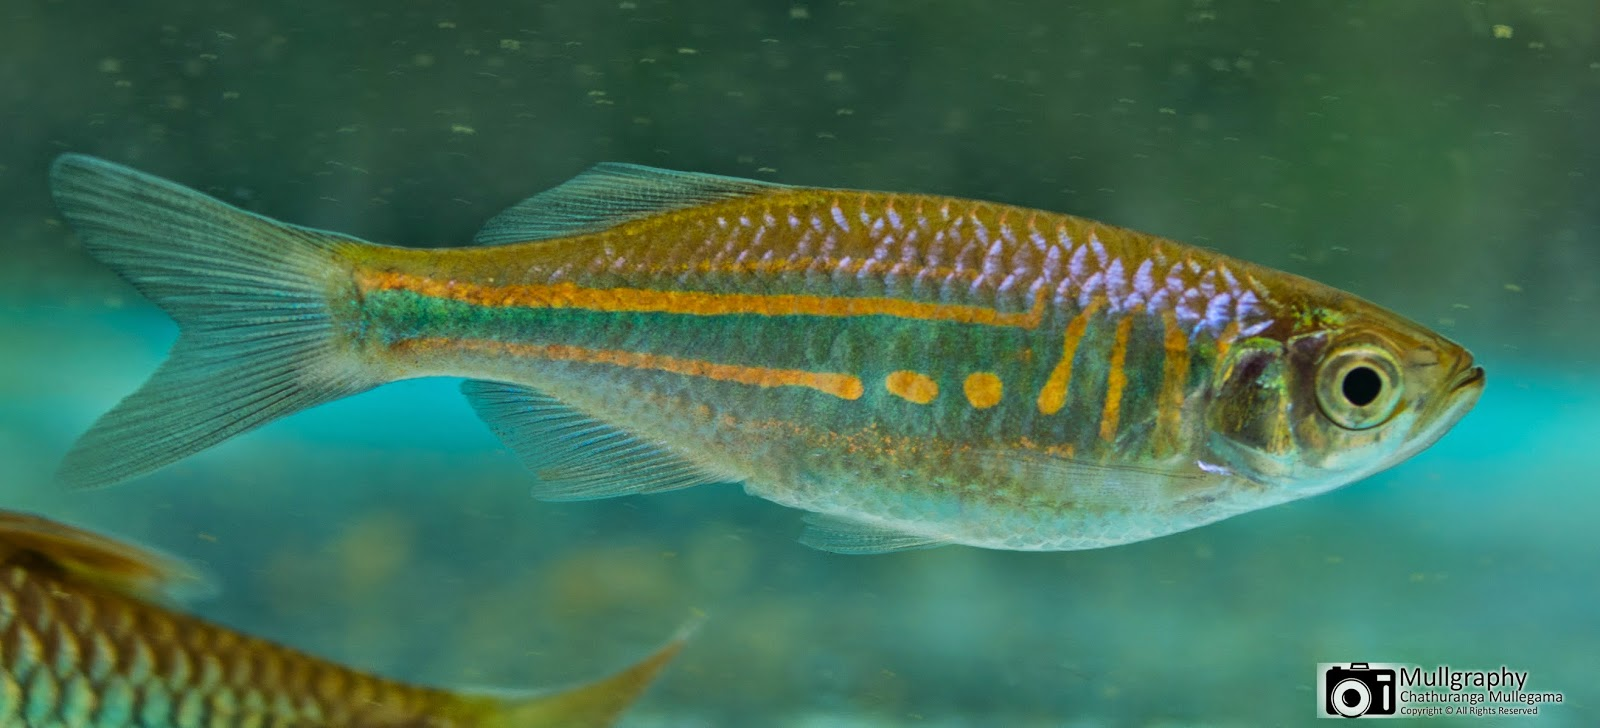 Danio malabaricus giant danio dankola salaya for Giant danio fish